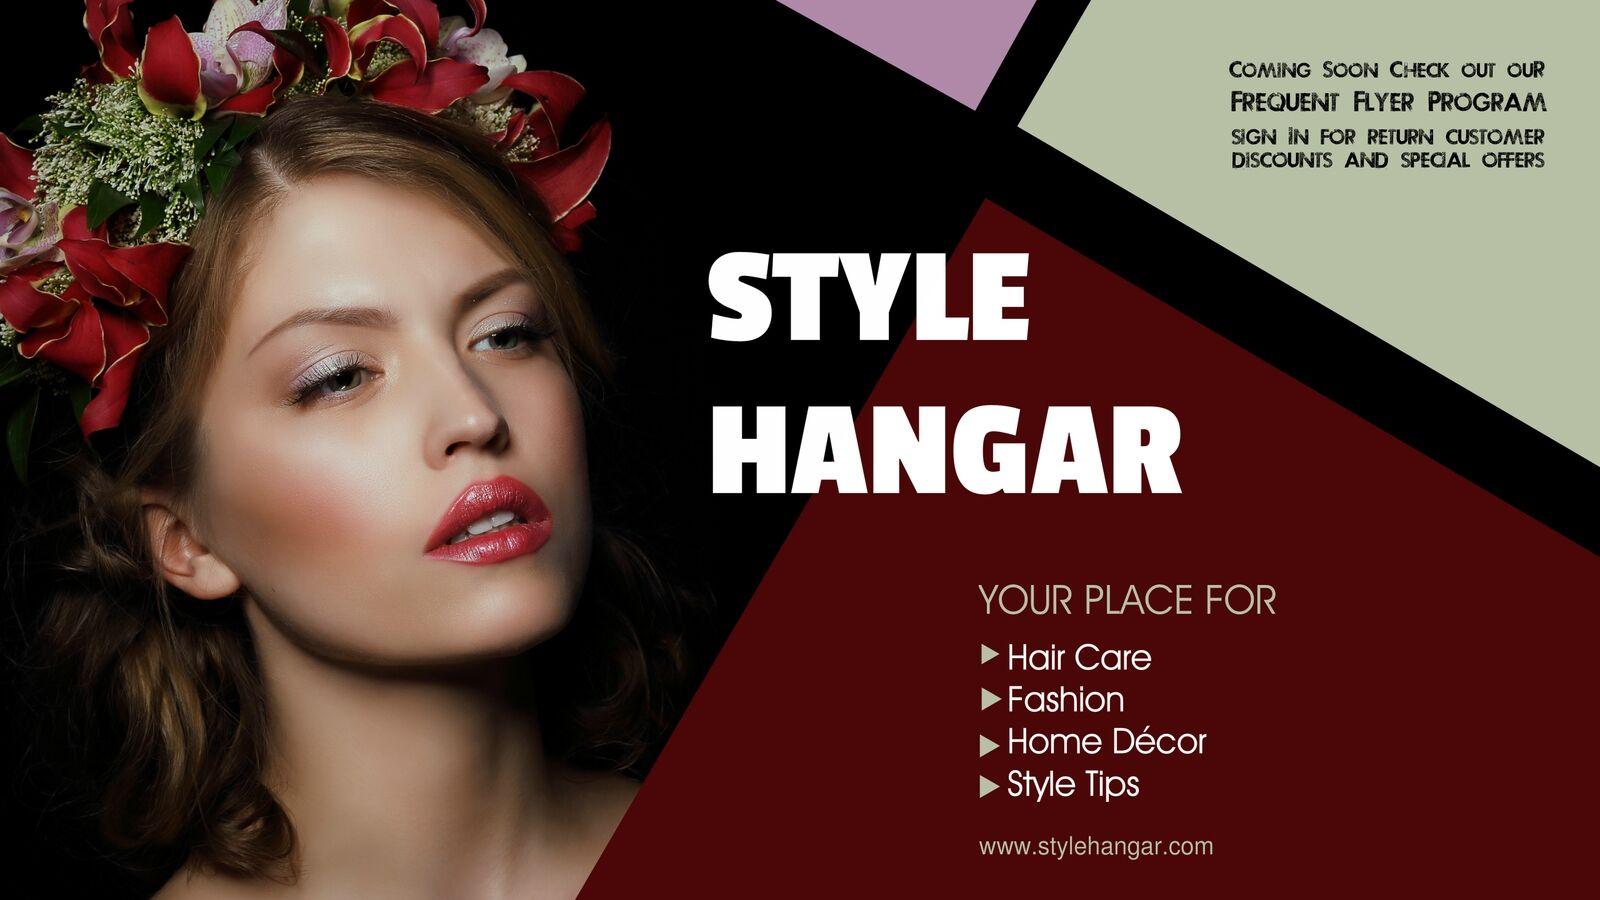 StyleHangar